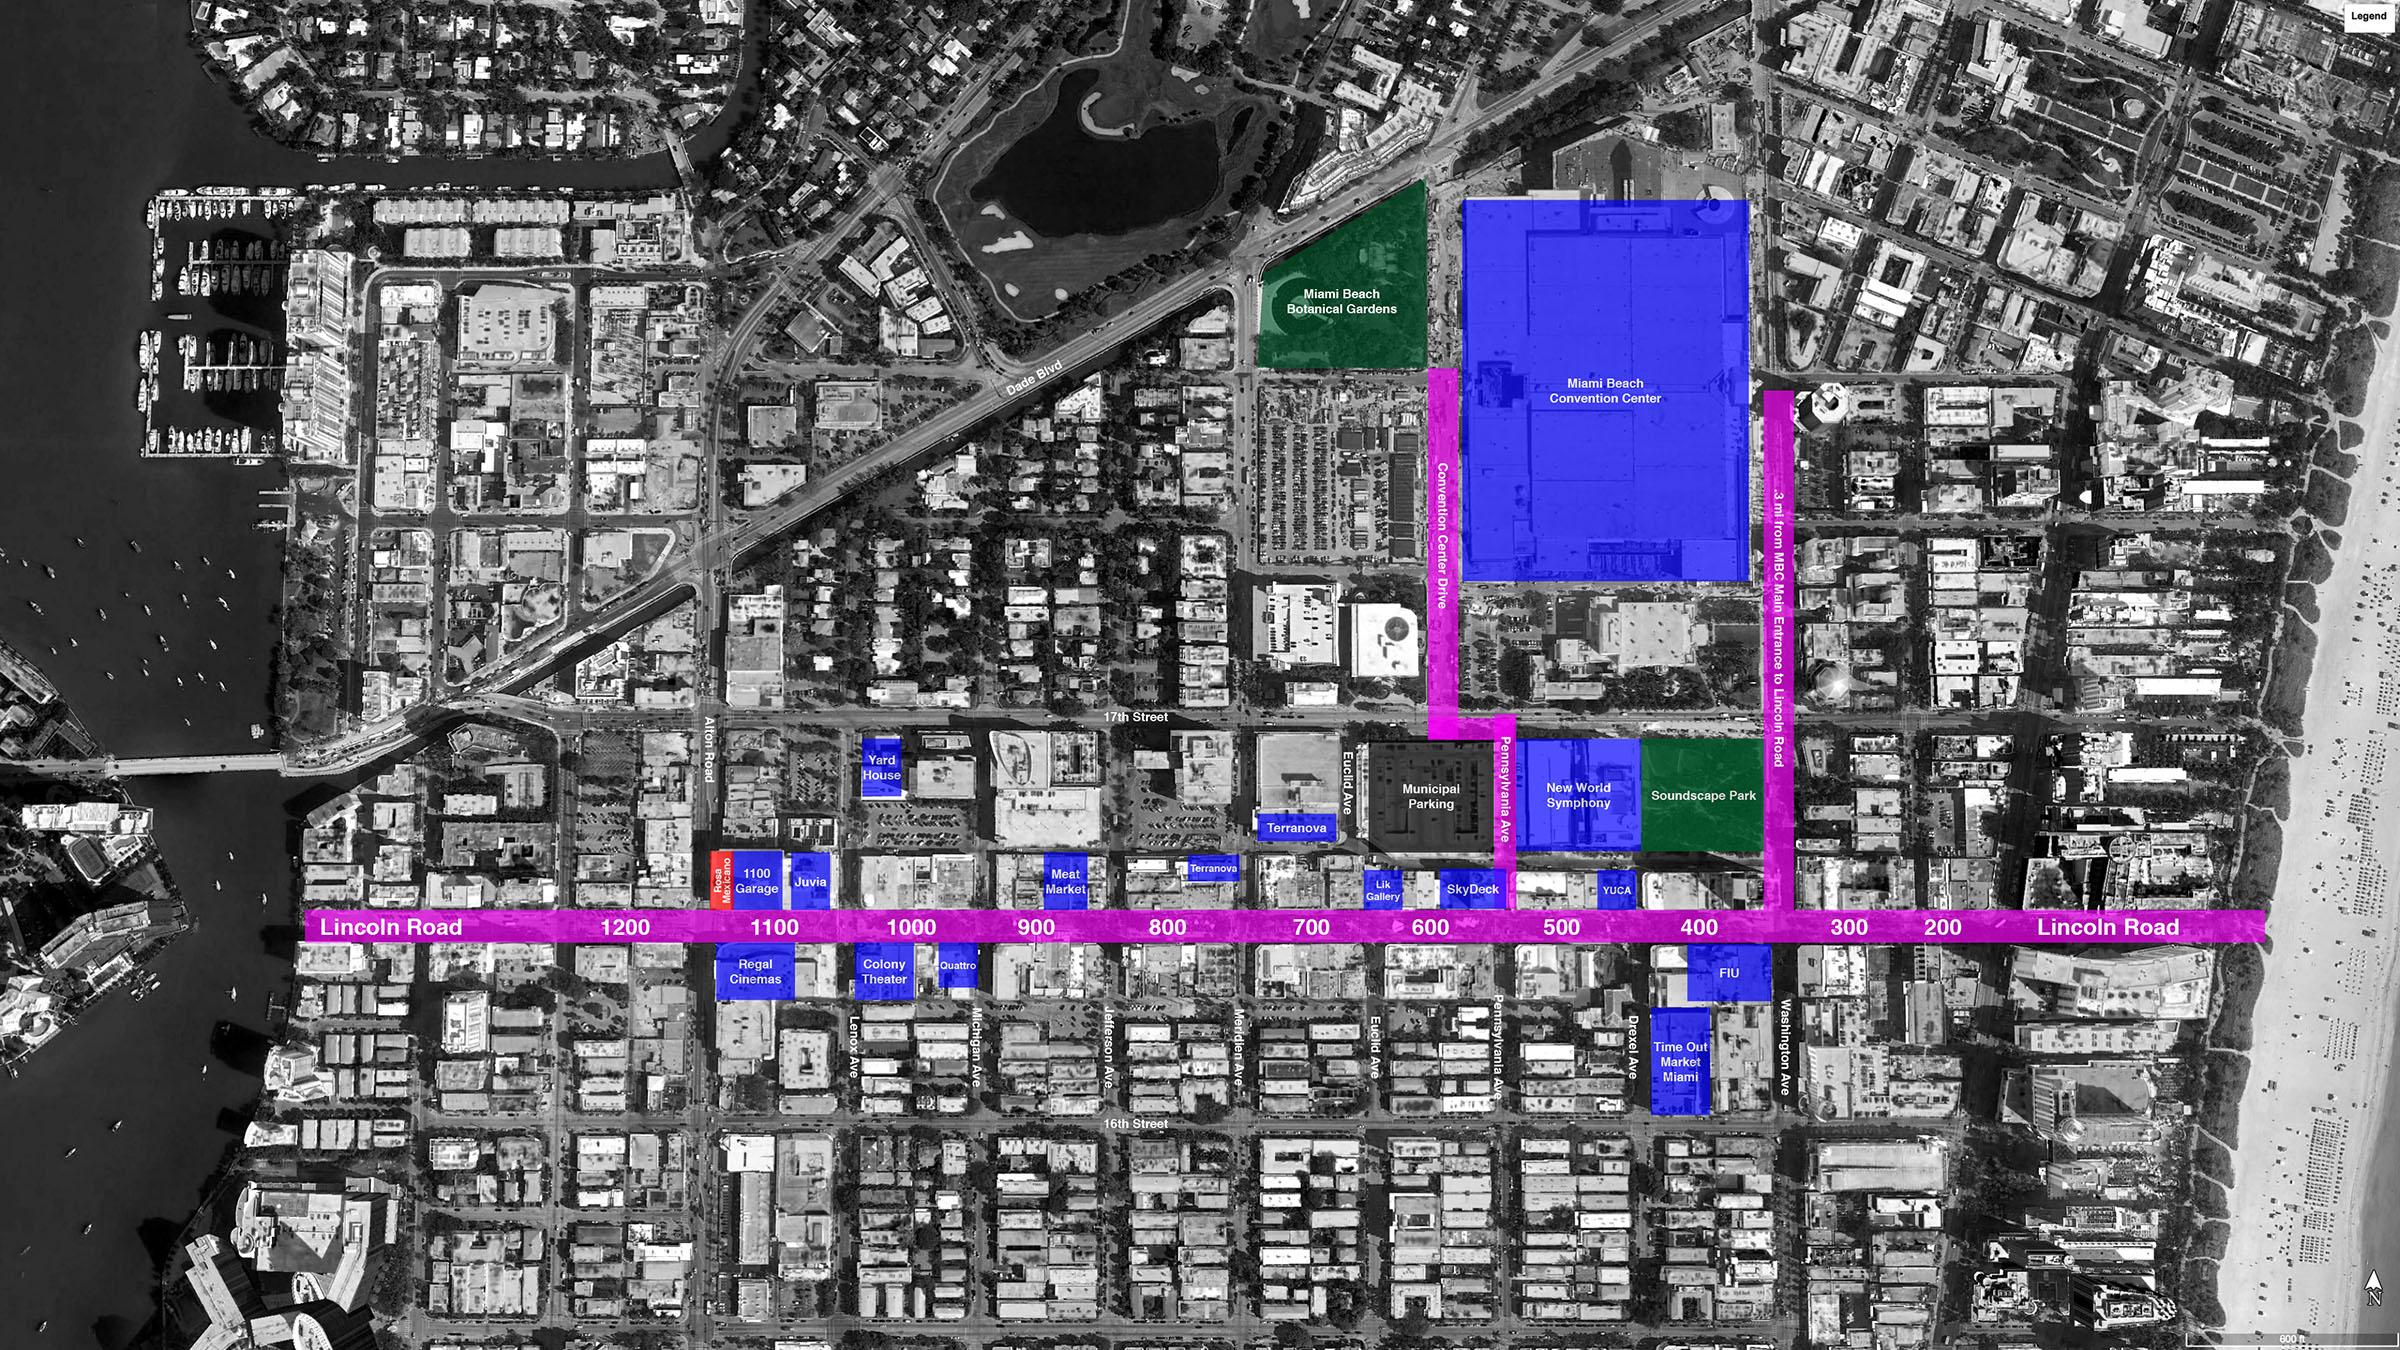 Lincoln Road BID map